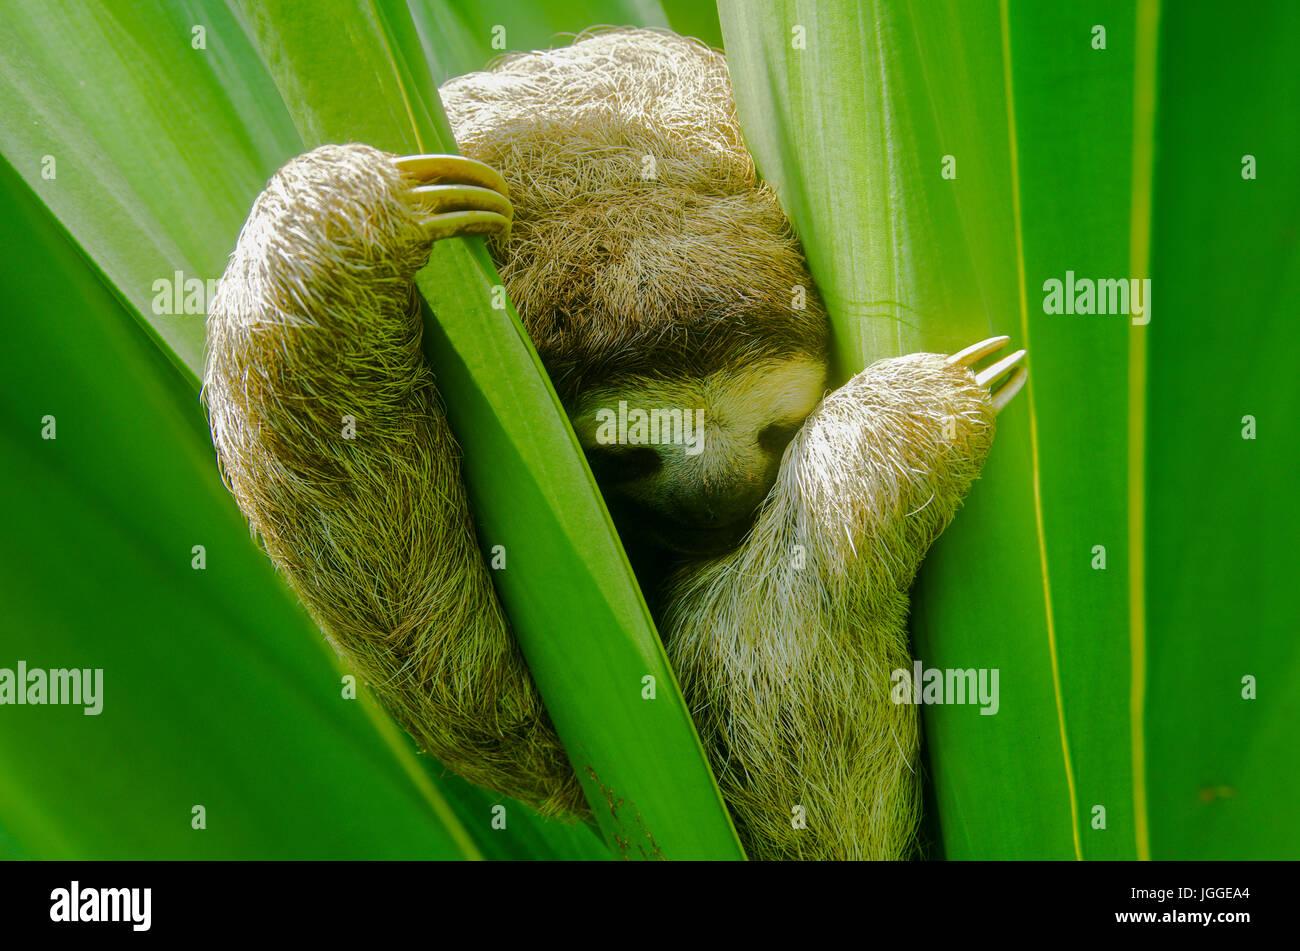 La faune paresseux tridactyle image prise au Panama Photo Stock